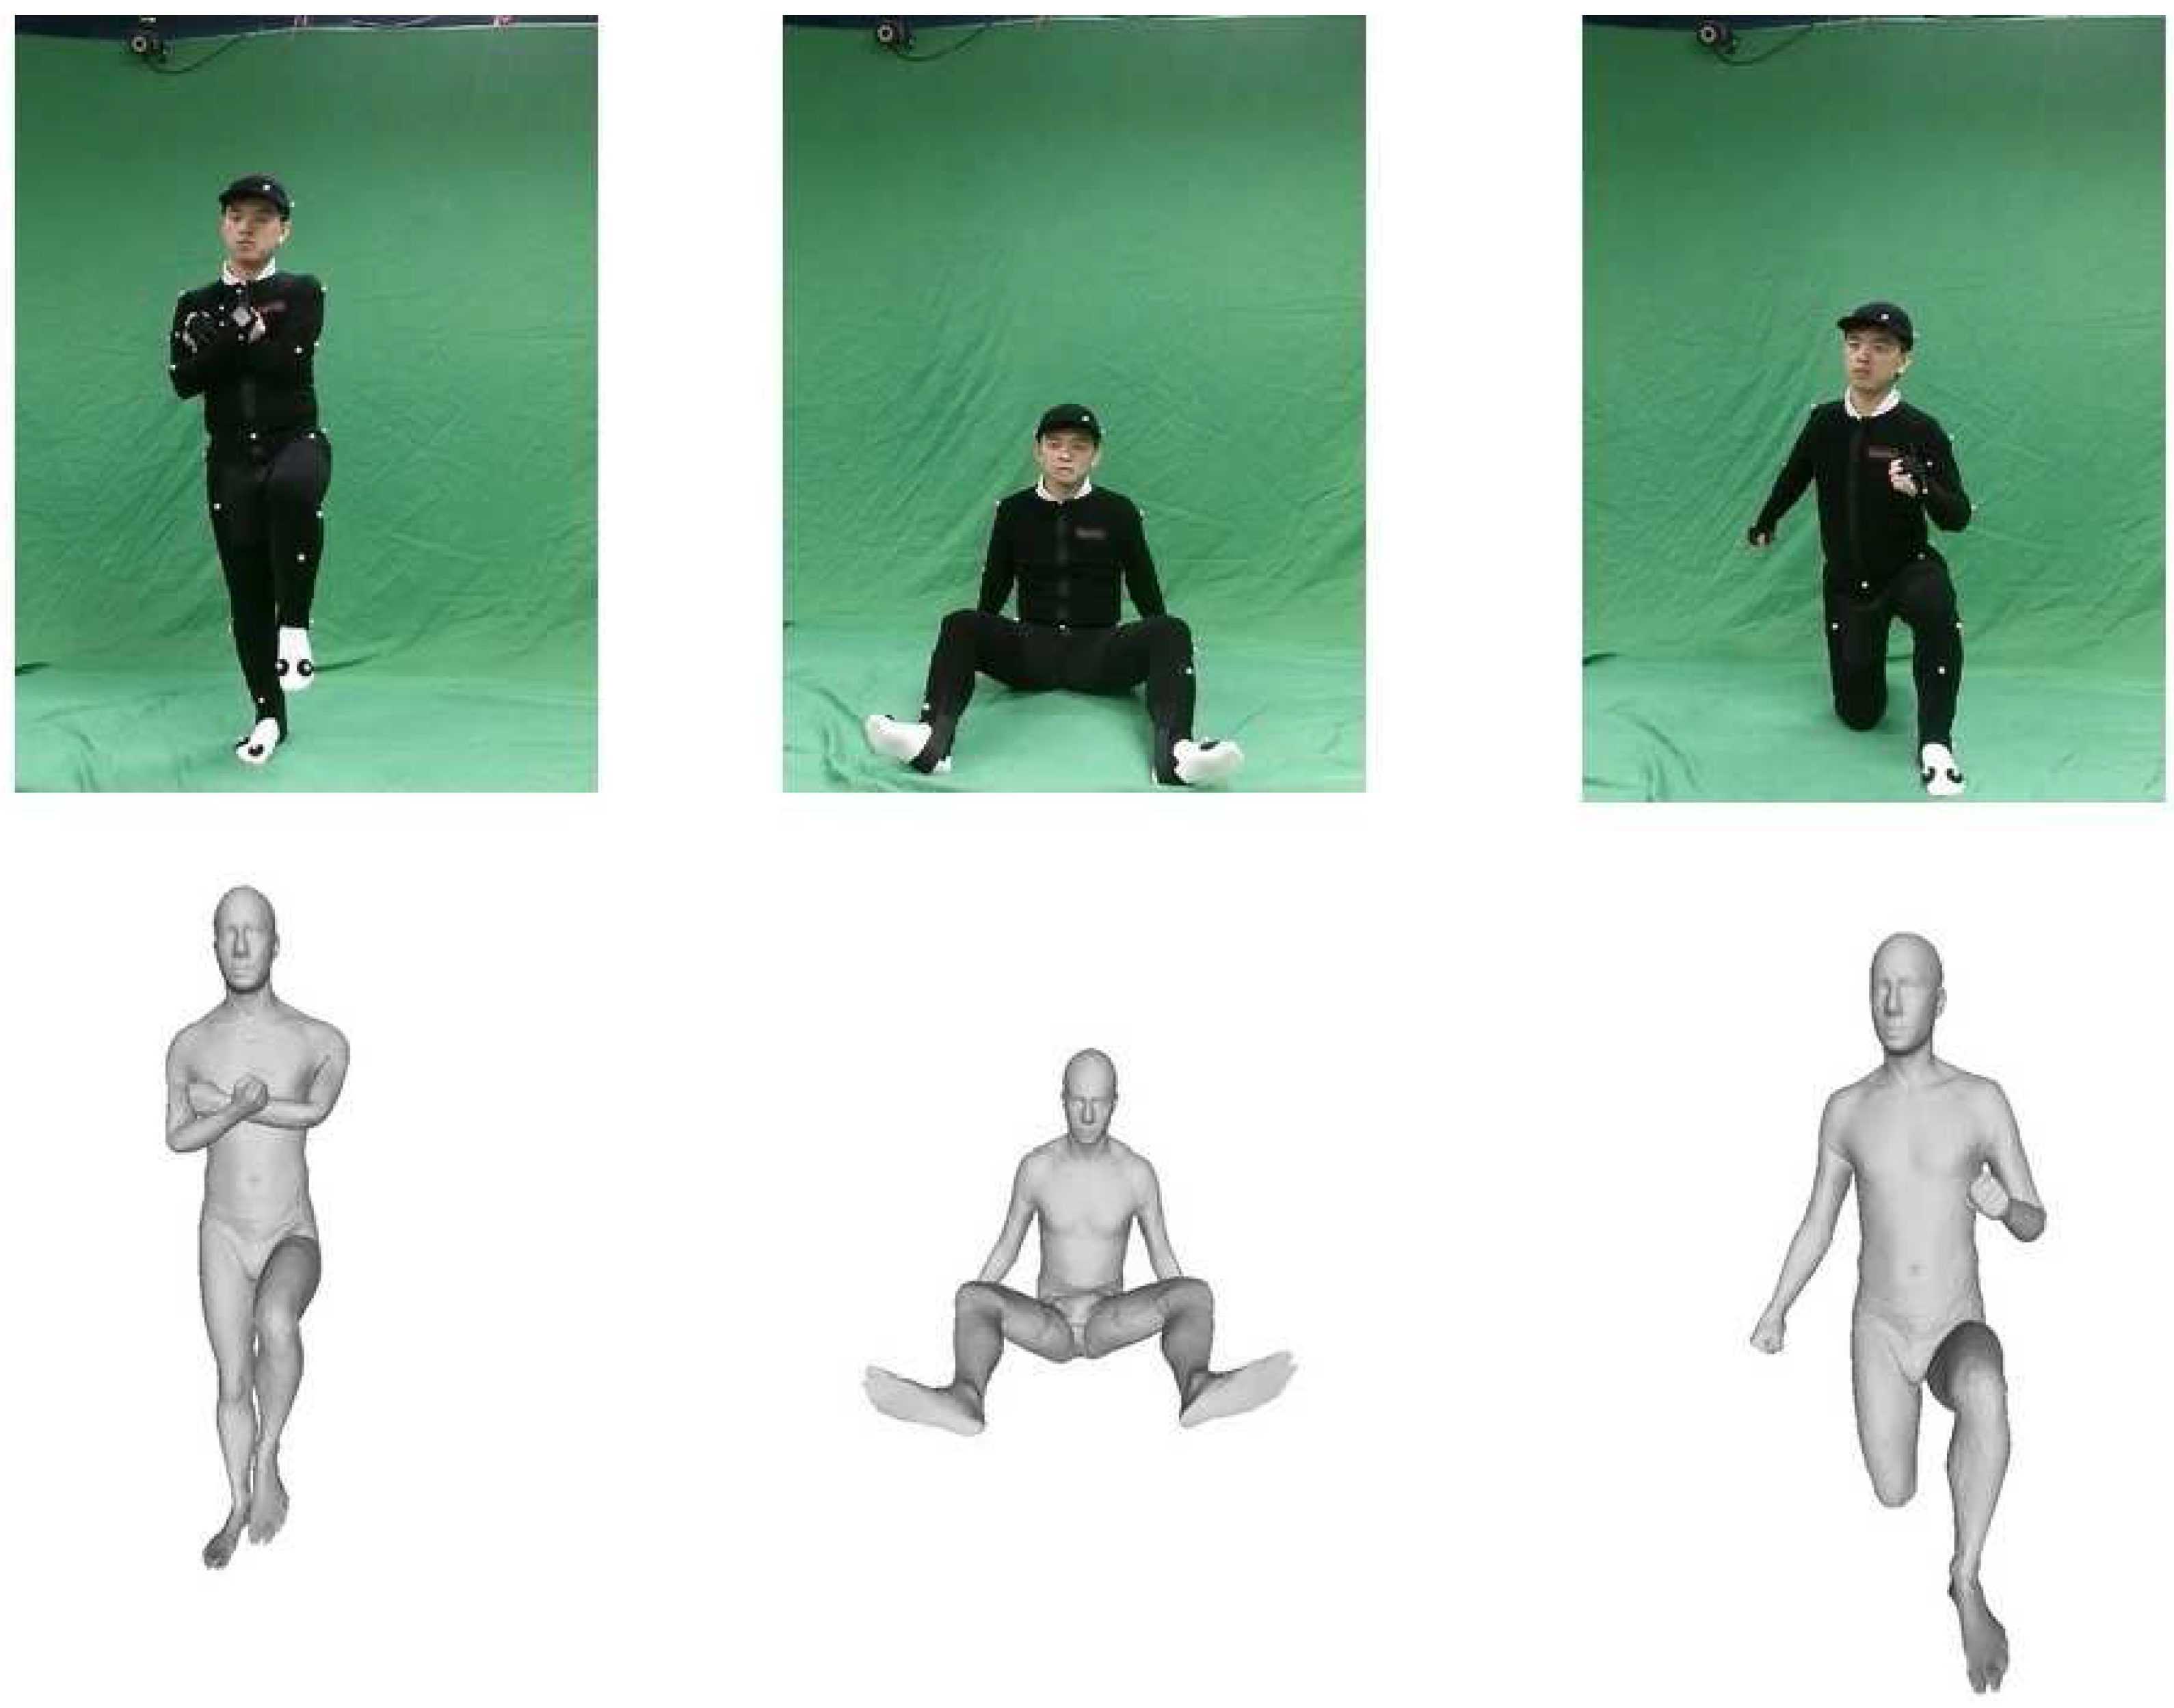 Sensors | Free Full-Text | Leveraging Two Kinect Sensors for